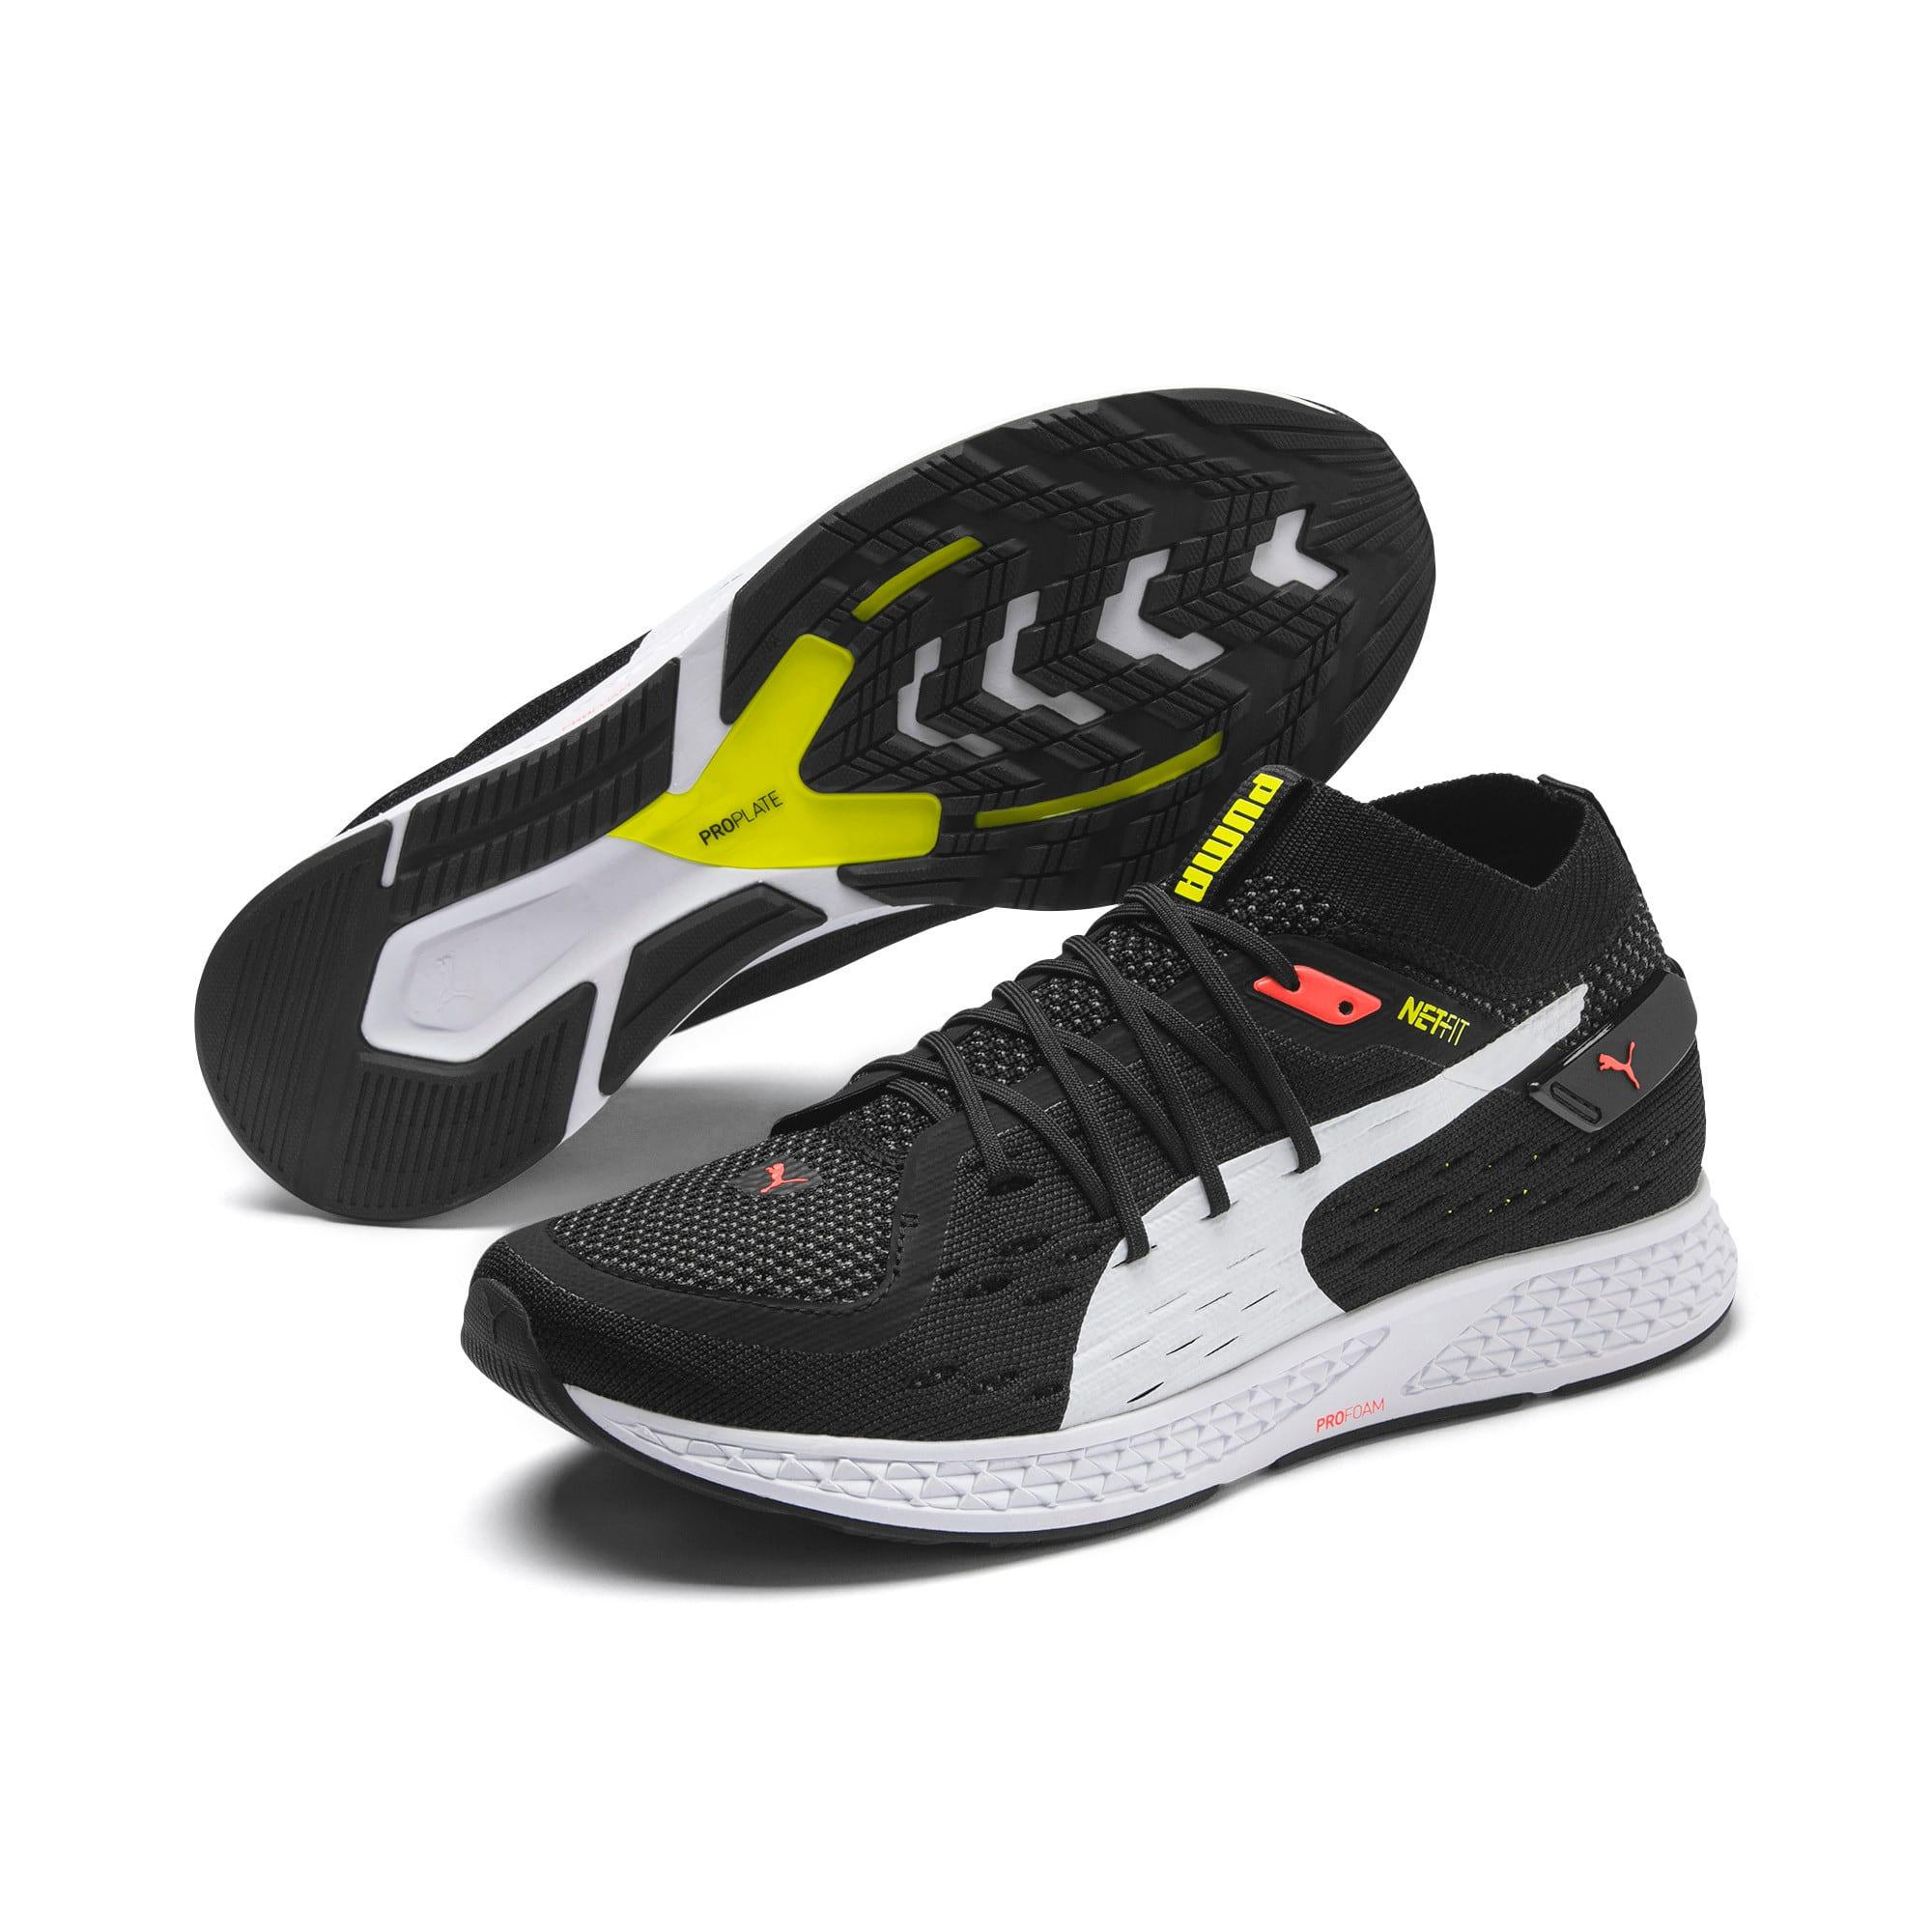 Thumbnail 2 of SPEED 500 Men's Running Shoes, Black-White-Red-Yellow, medium